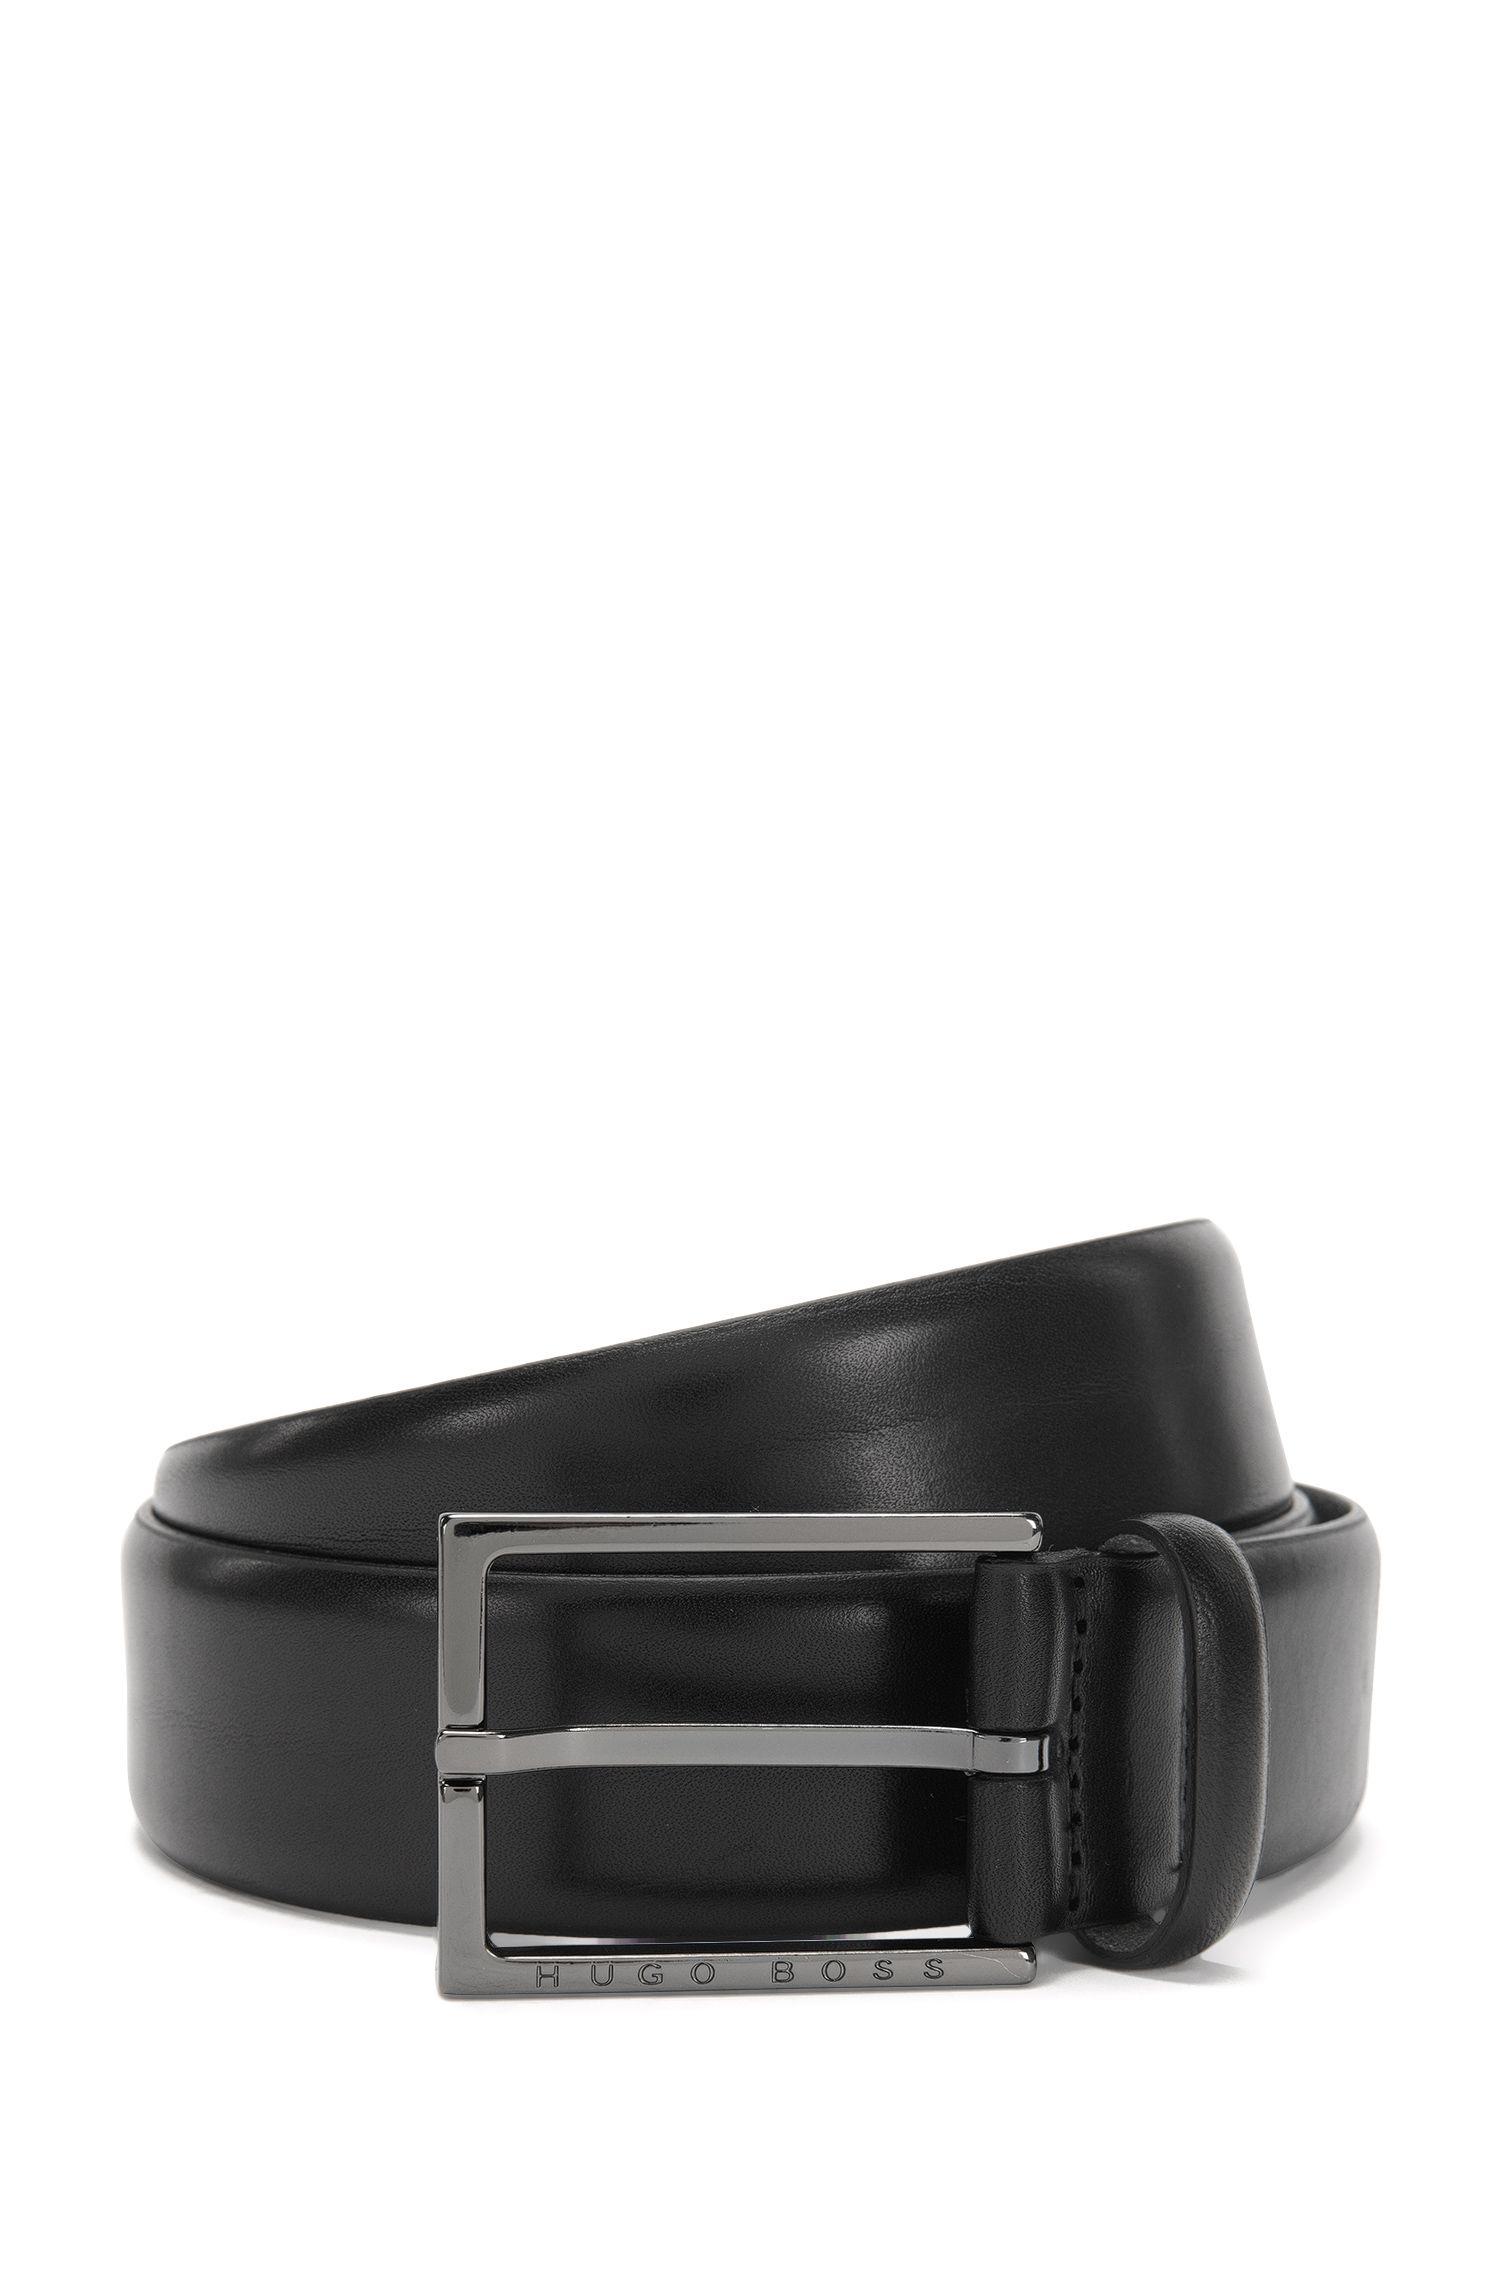 Gürtel aus Leder mit Lochmuster-Detail: 'Callix_Sz35_ltbg'